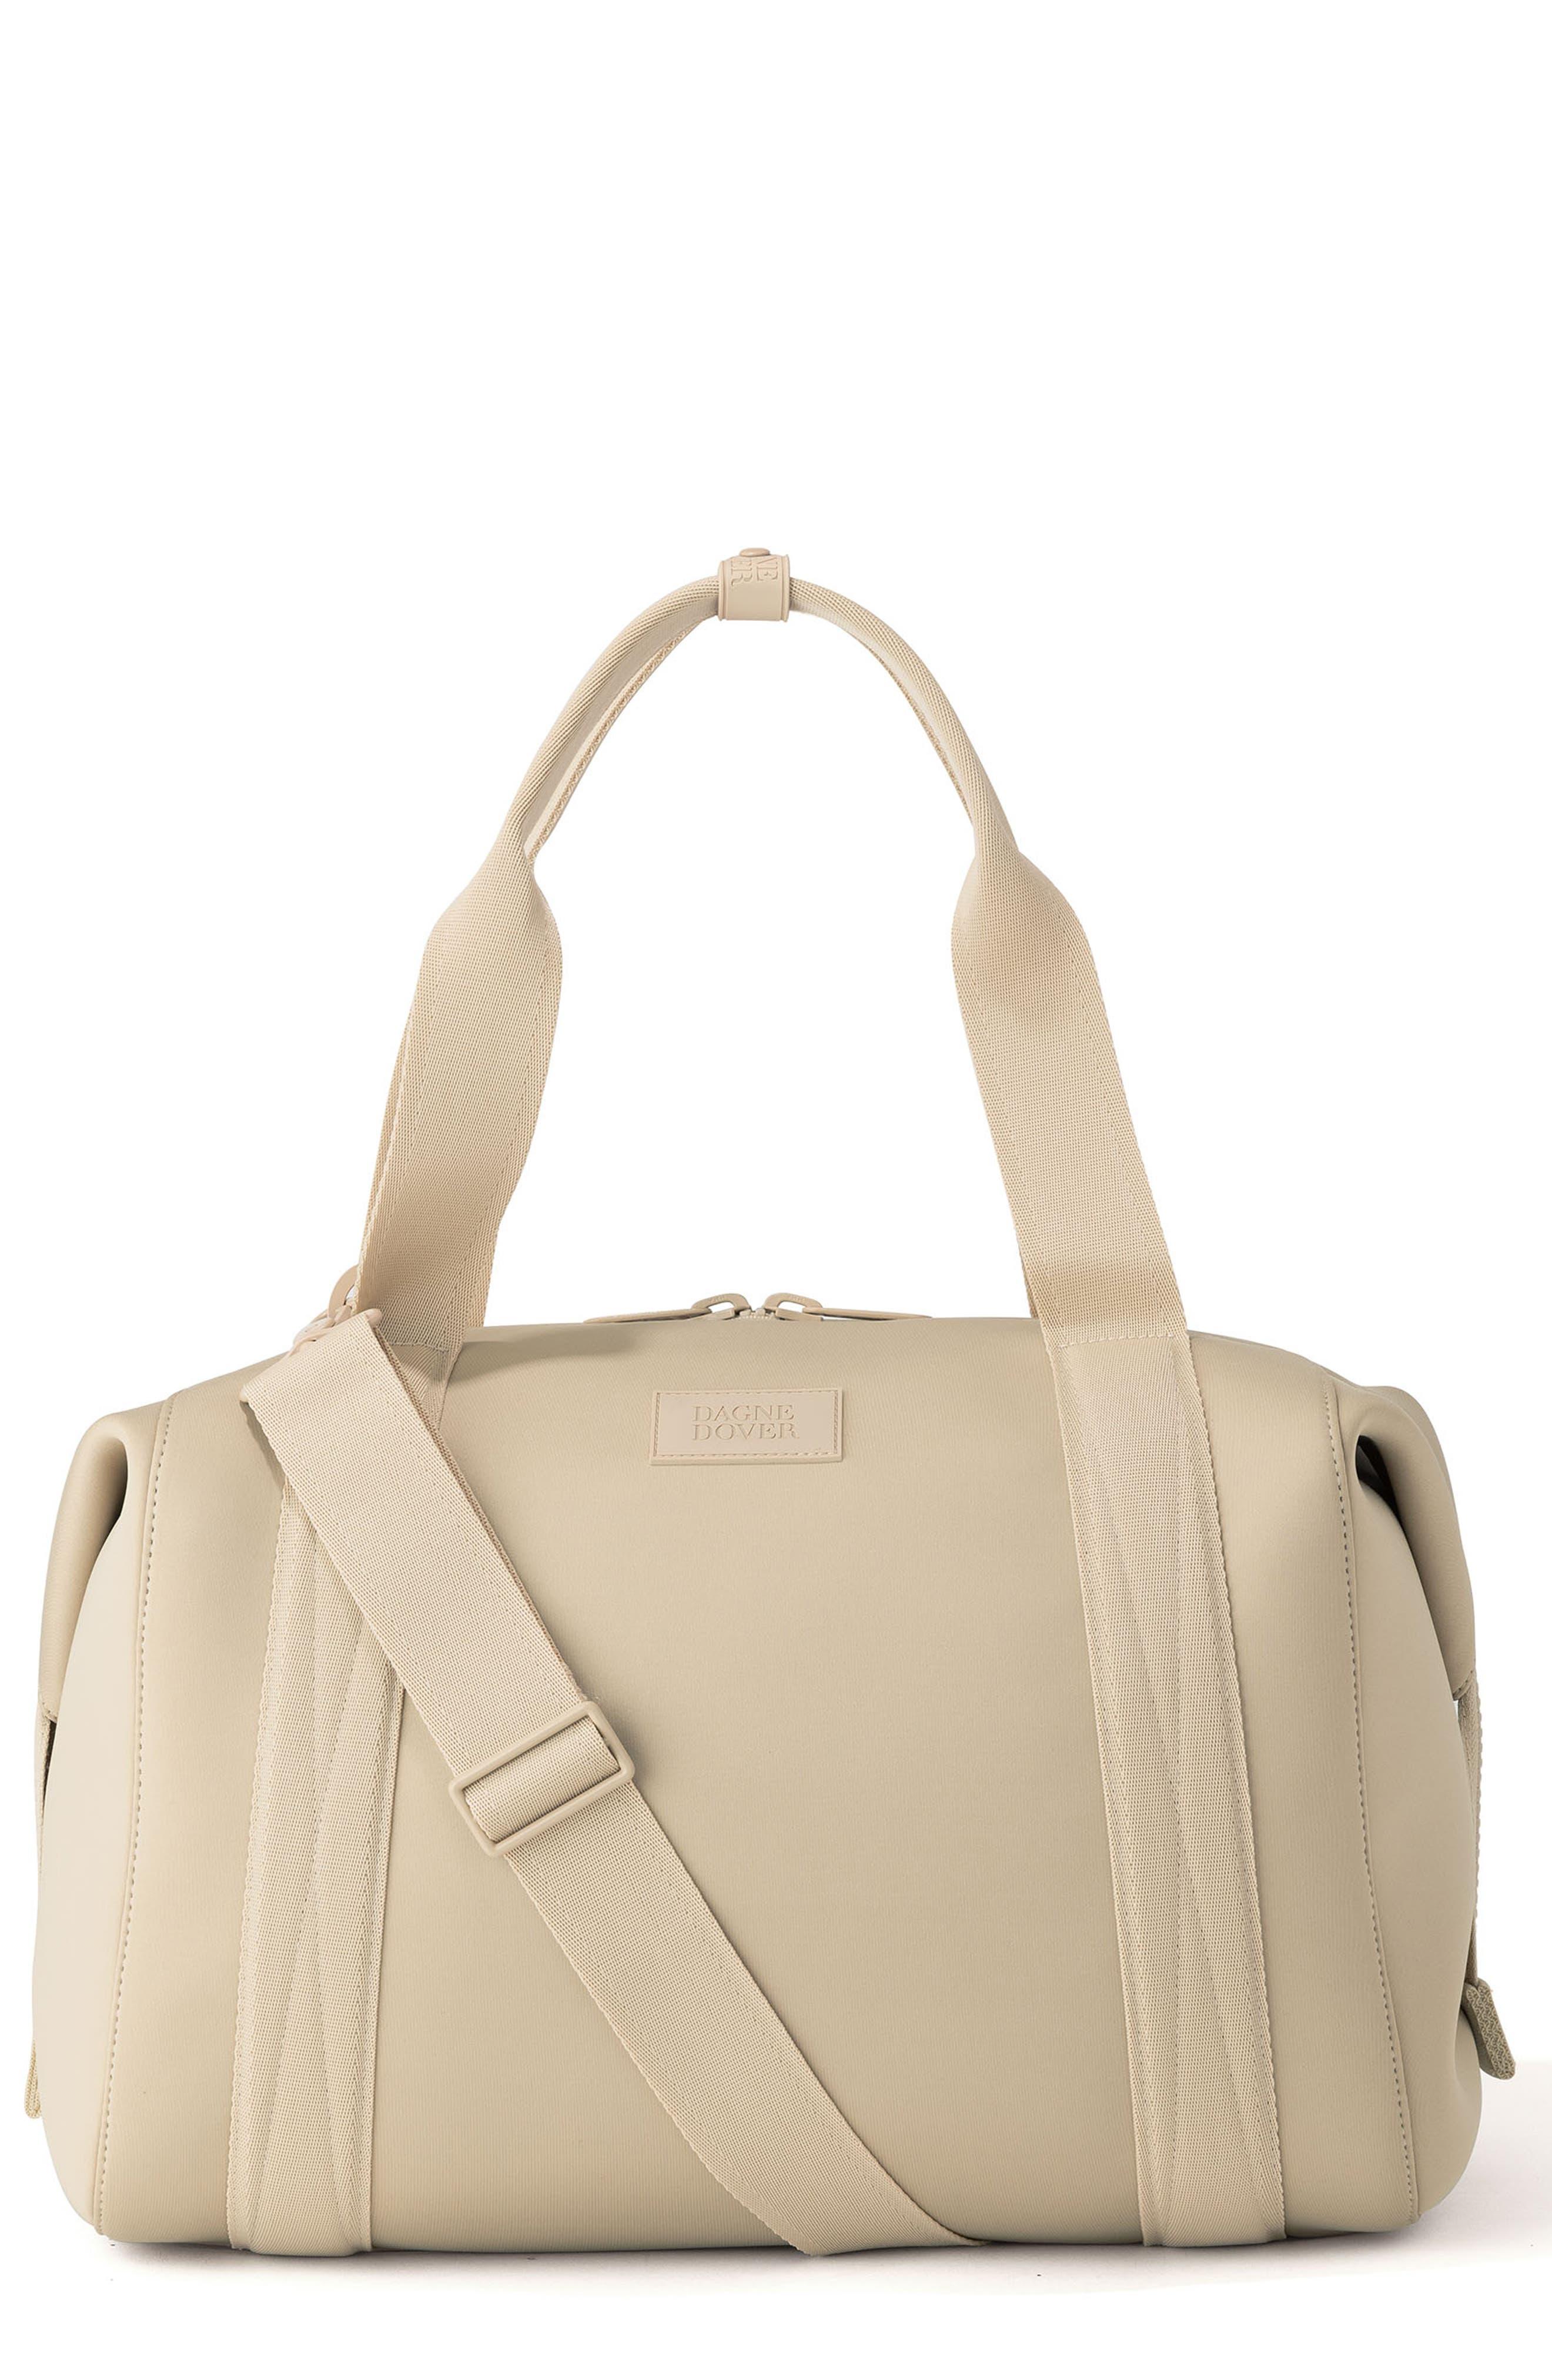 365 Large Landon Neoprene Carryall Duffle Bag, Main, color, ALMOND LATTE